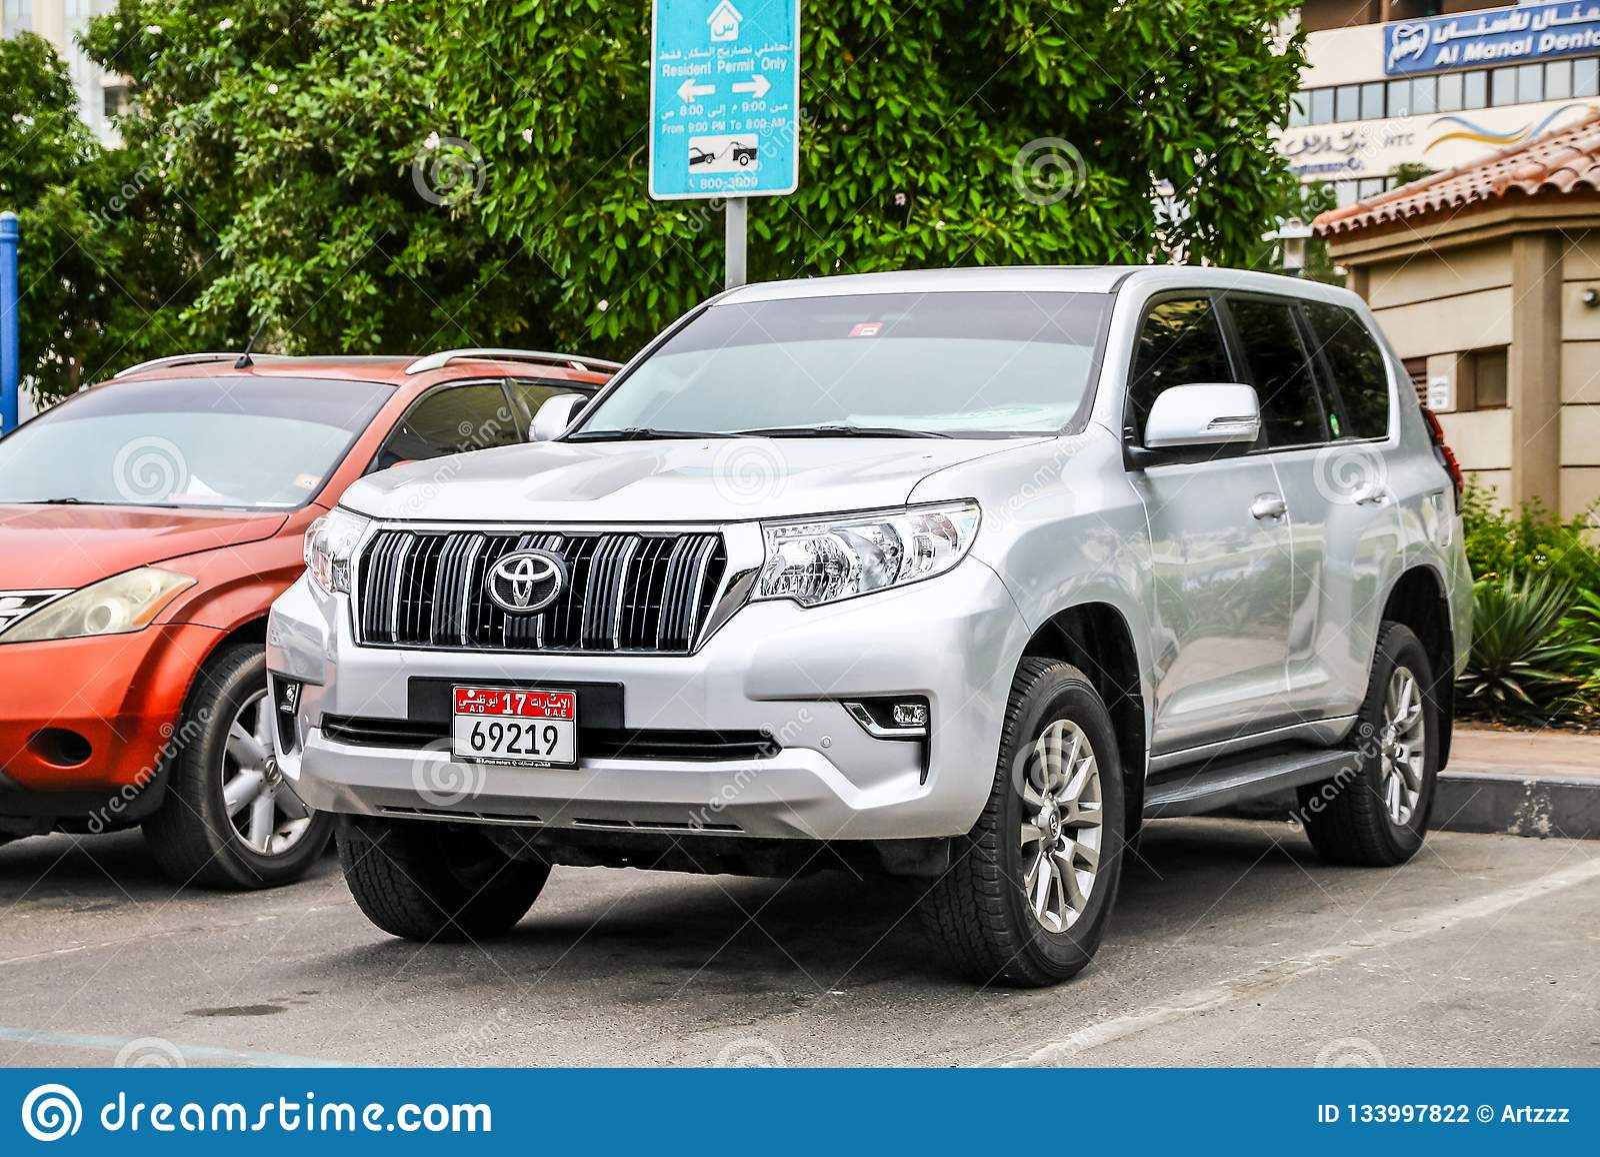 Toyota Land Cruiser Prado 150 Editorial Photography Image Of